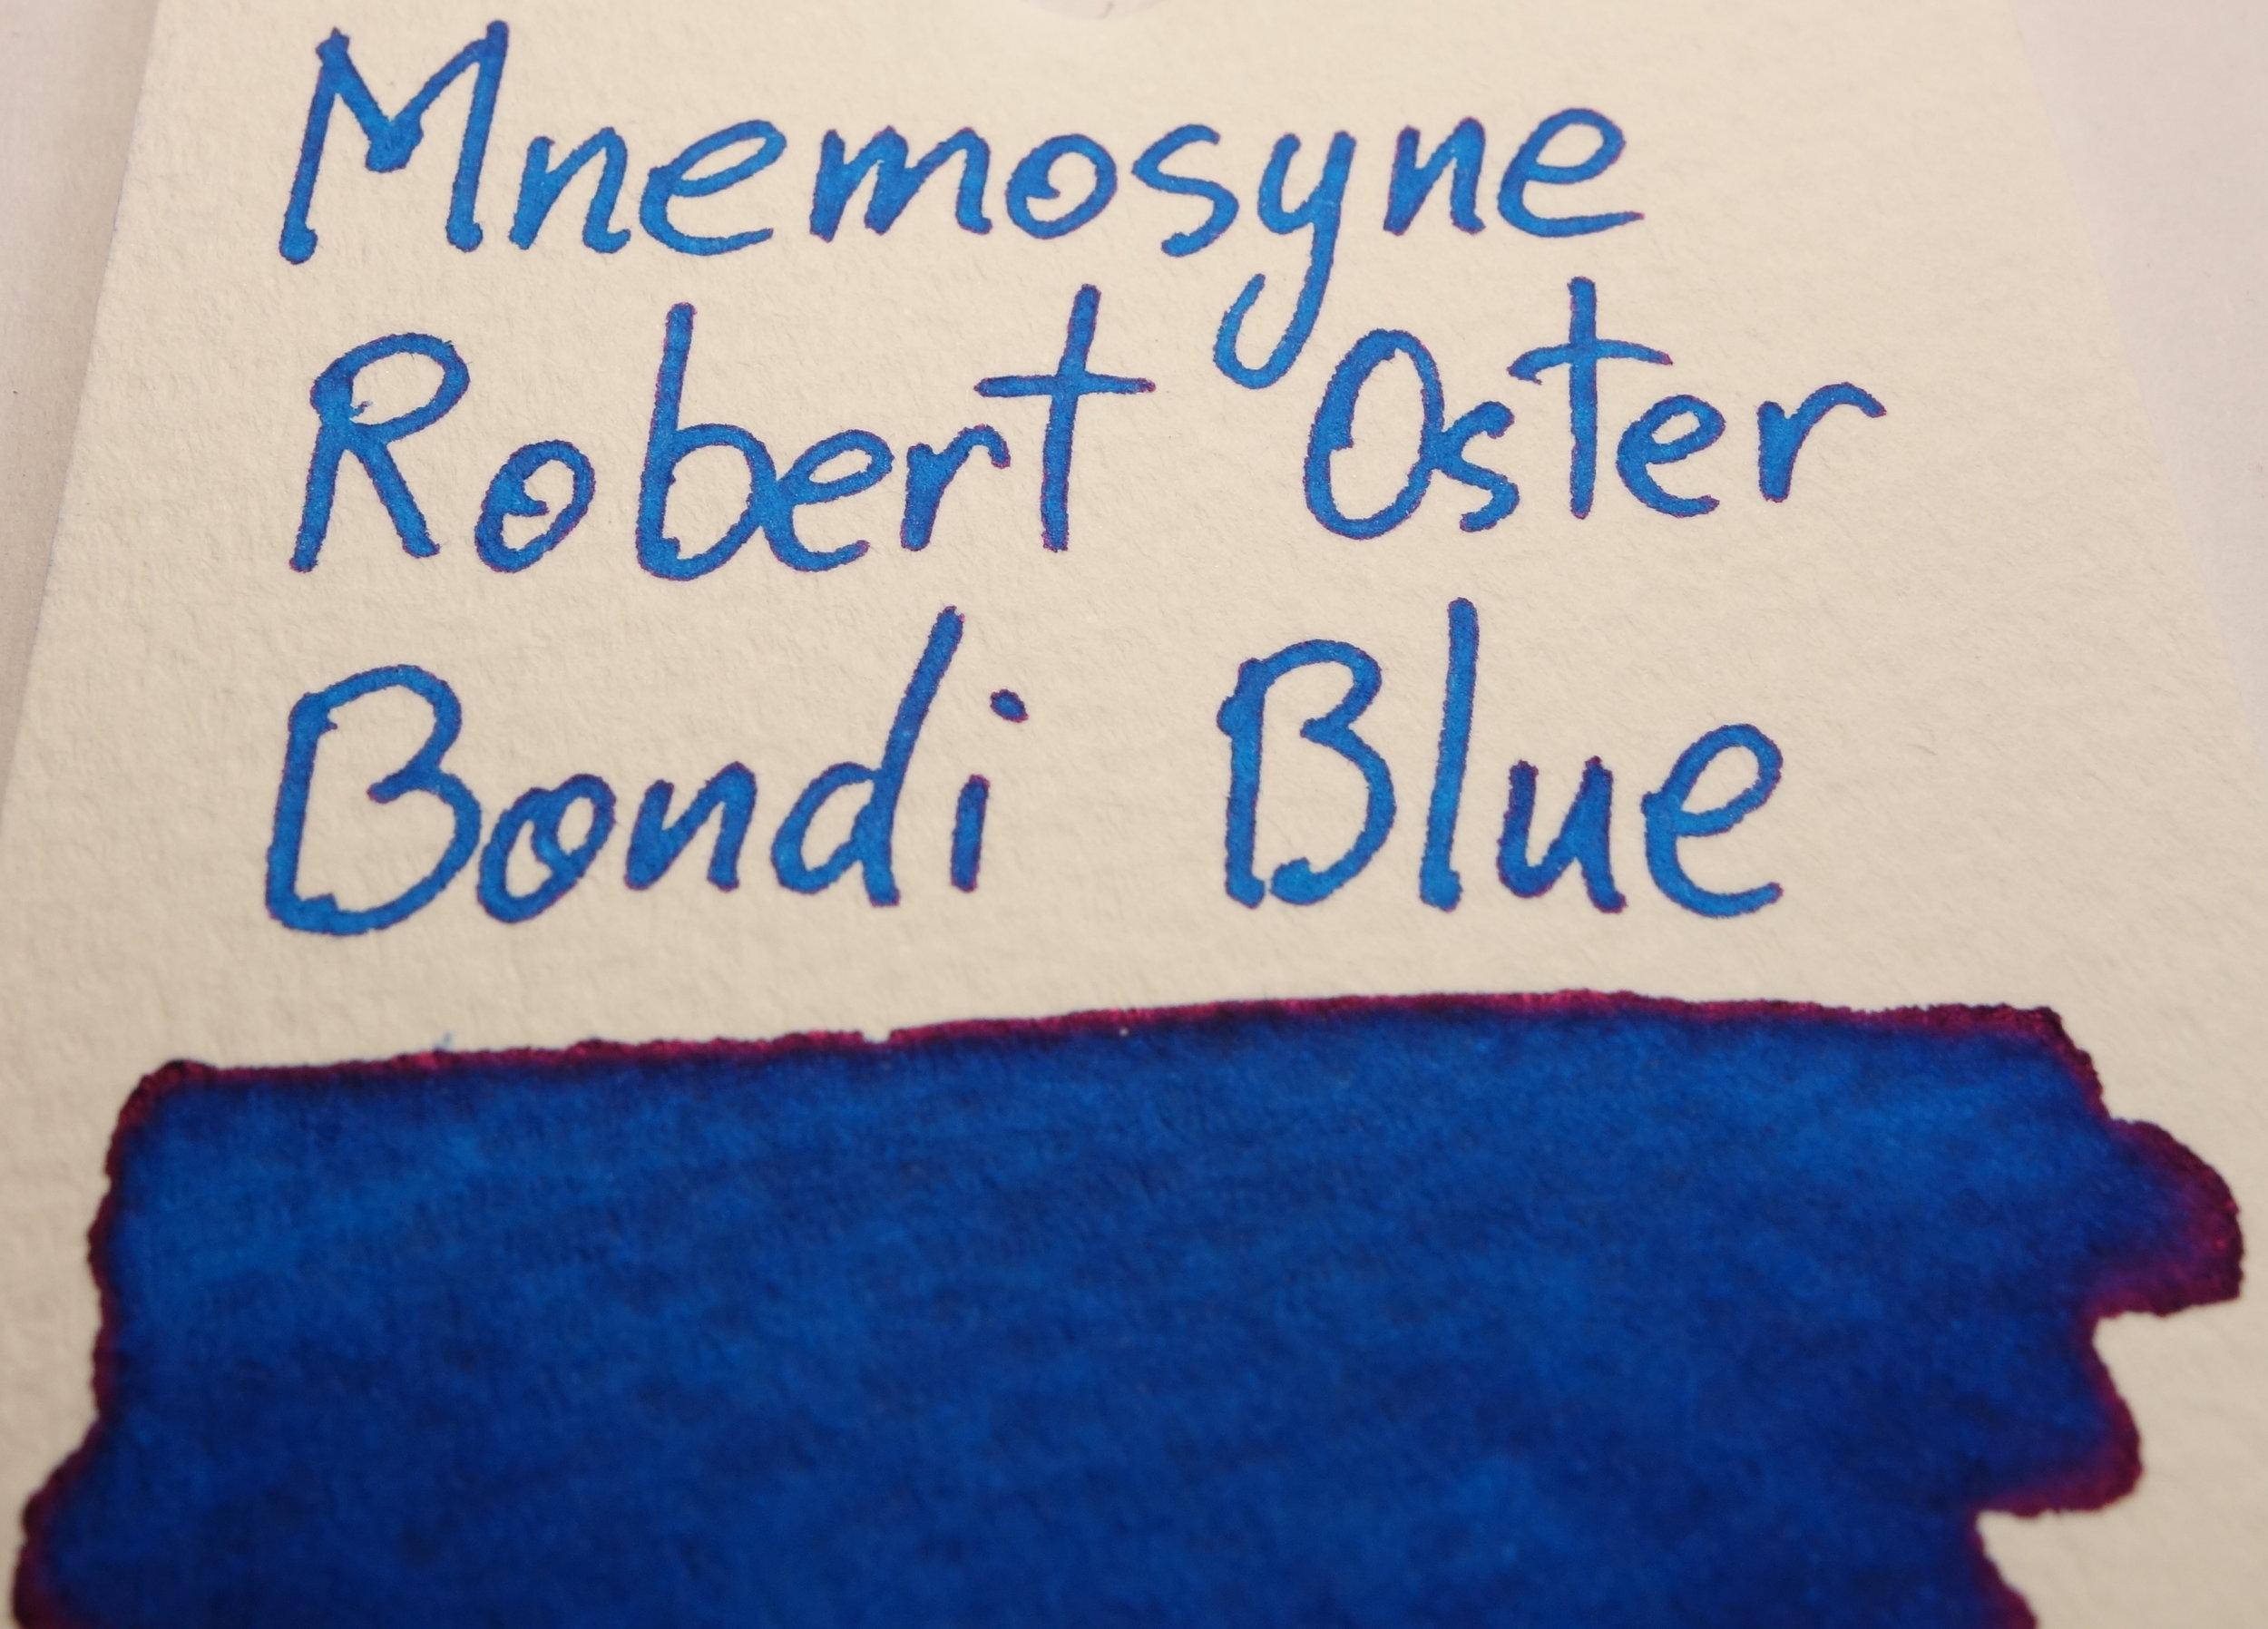 Robert Oster Bondi Blue Sheen Mnemosyne.JPG